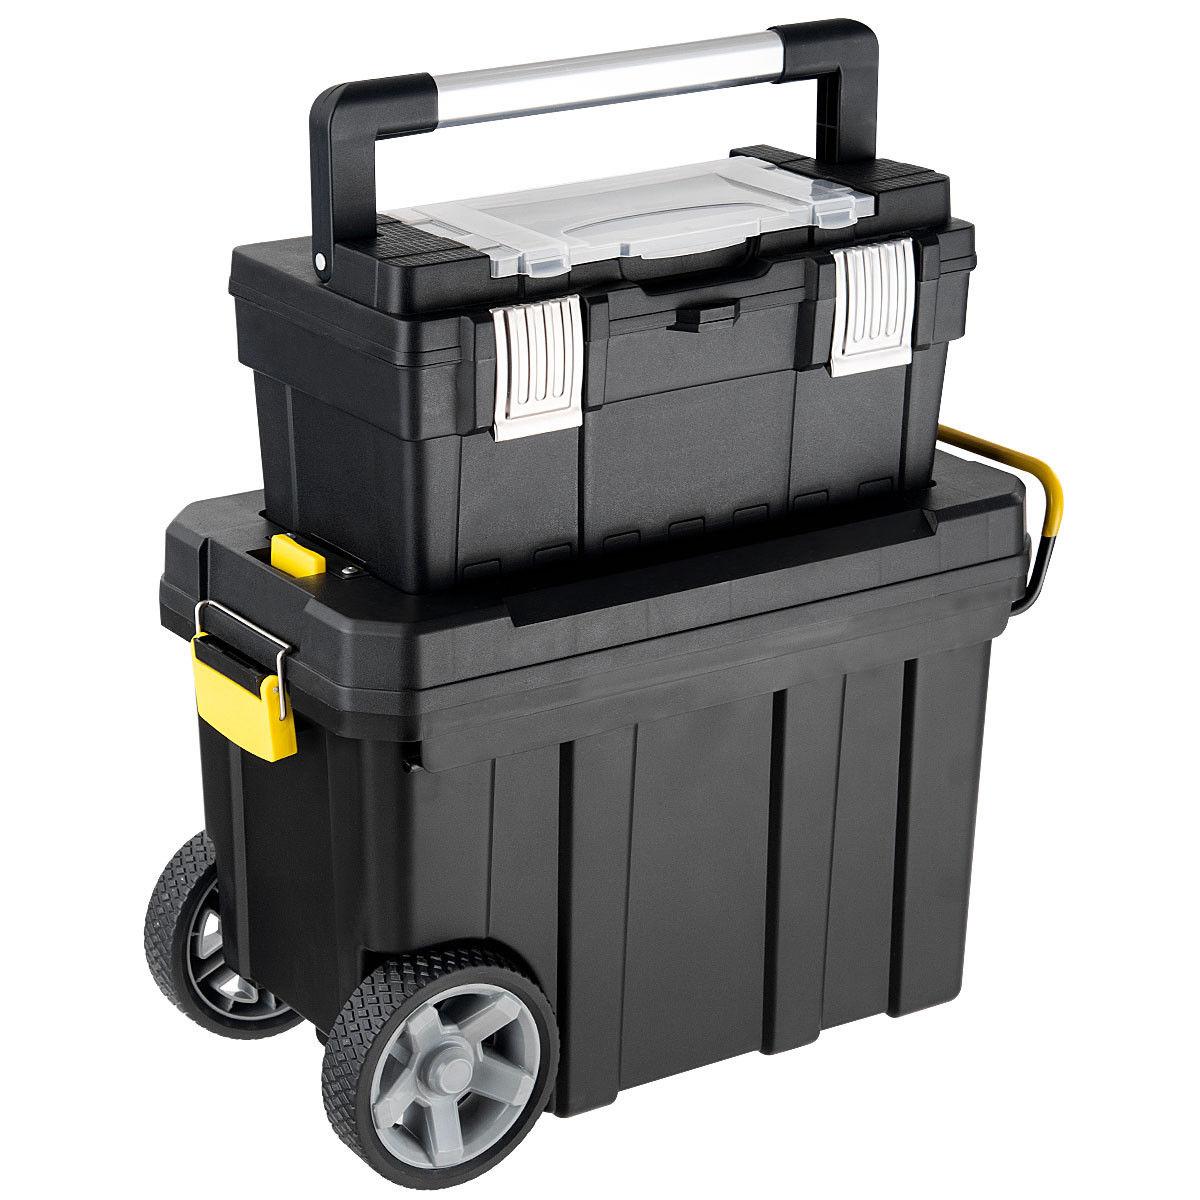 Goplus 2-in-1 Rolling Tool Box Set